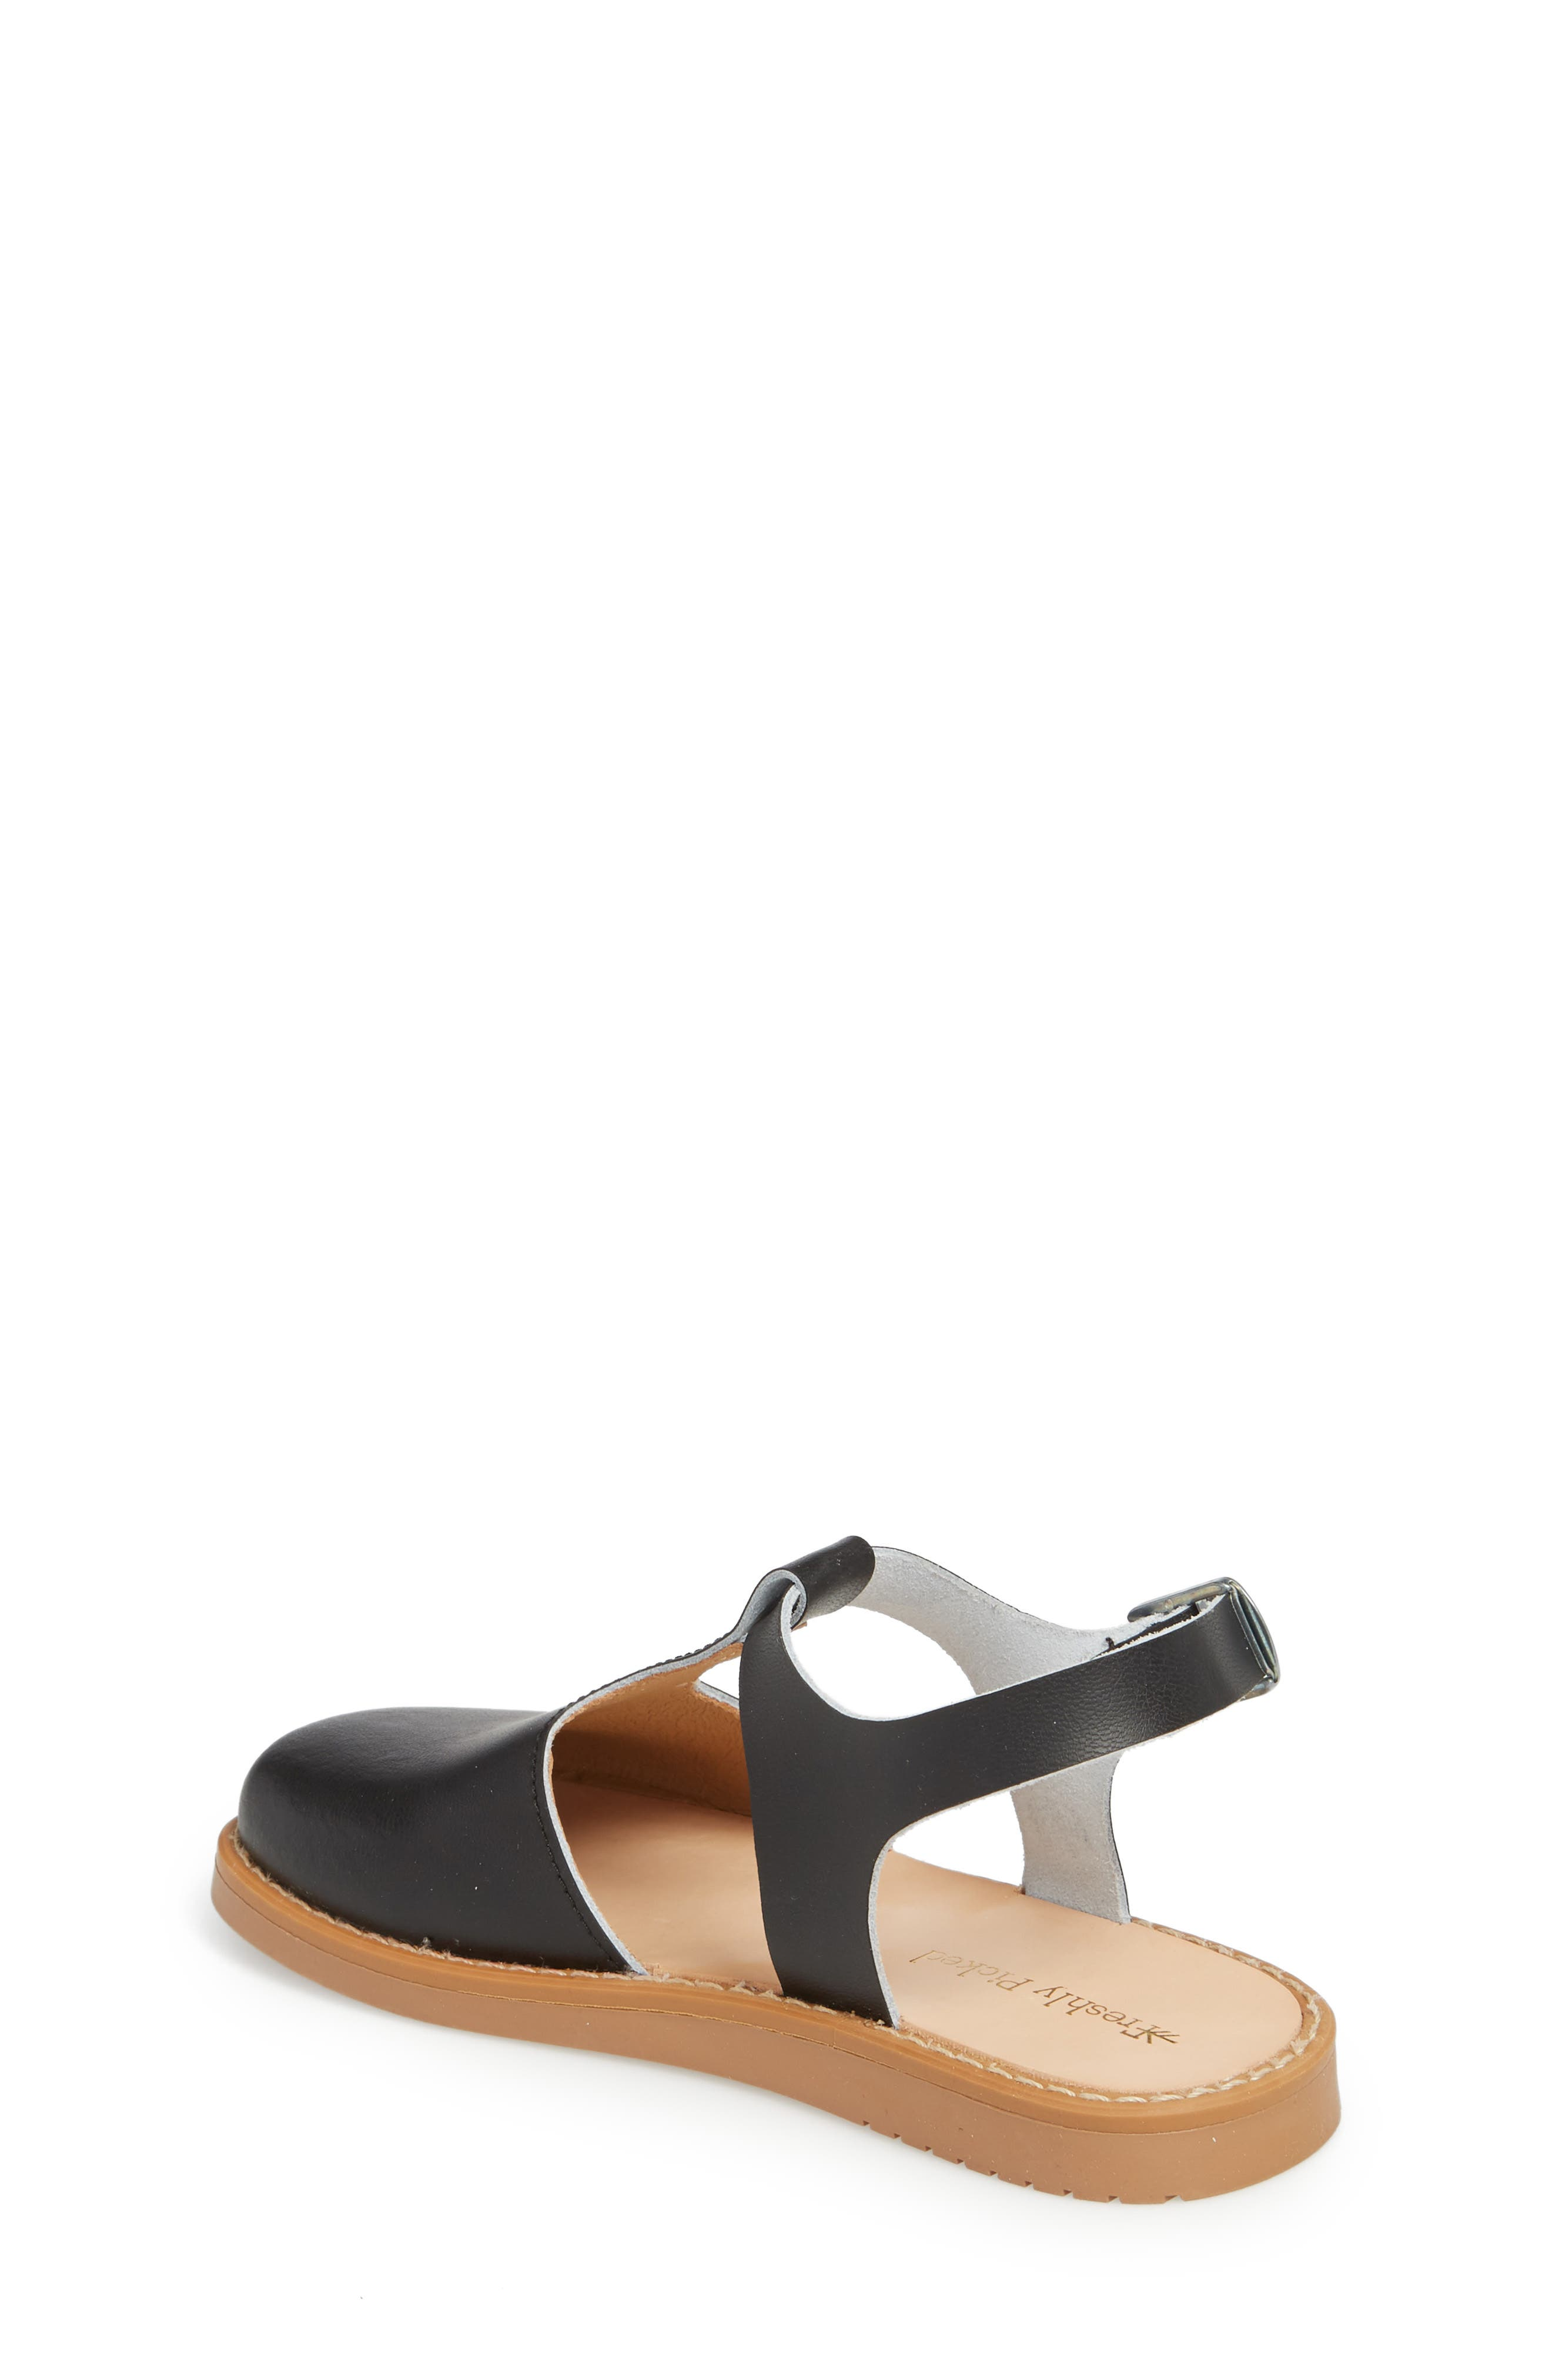 Newport Clog Sandal,                             Alternate thumbnail 2, color,                             BLACK